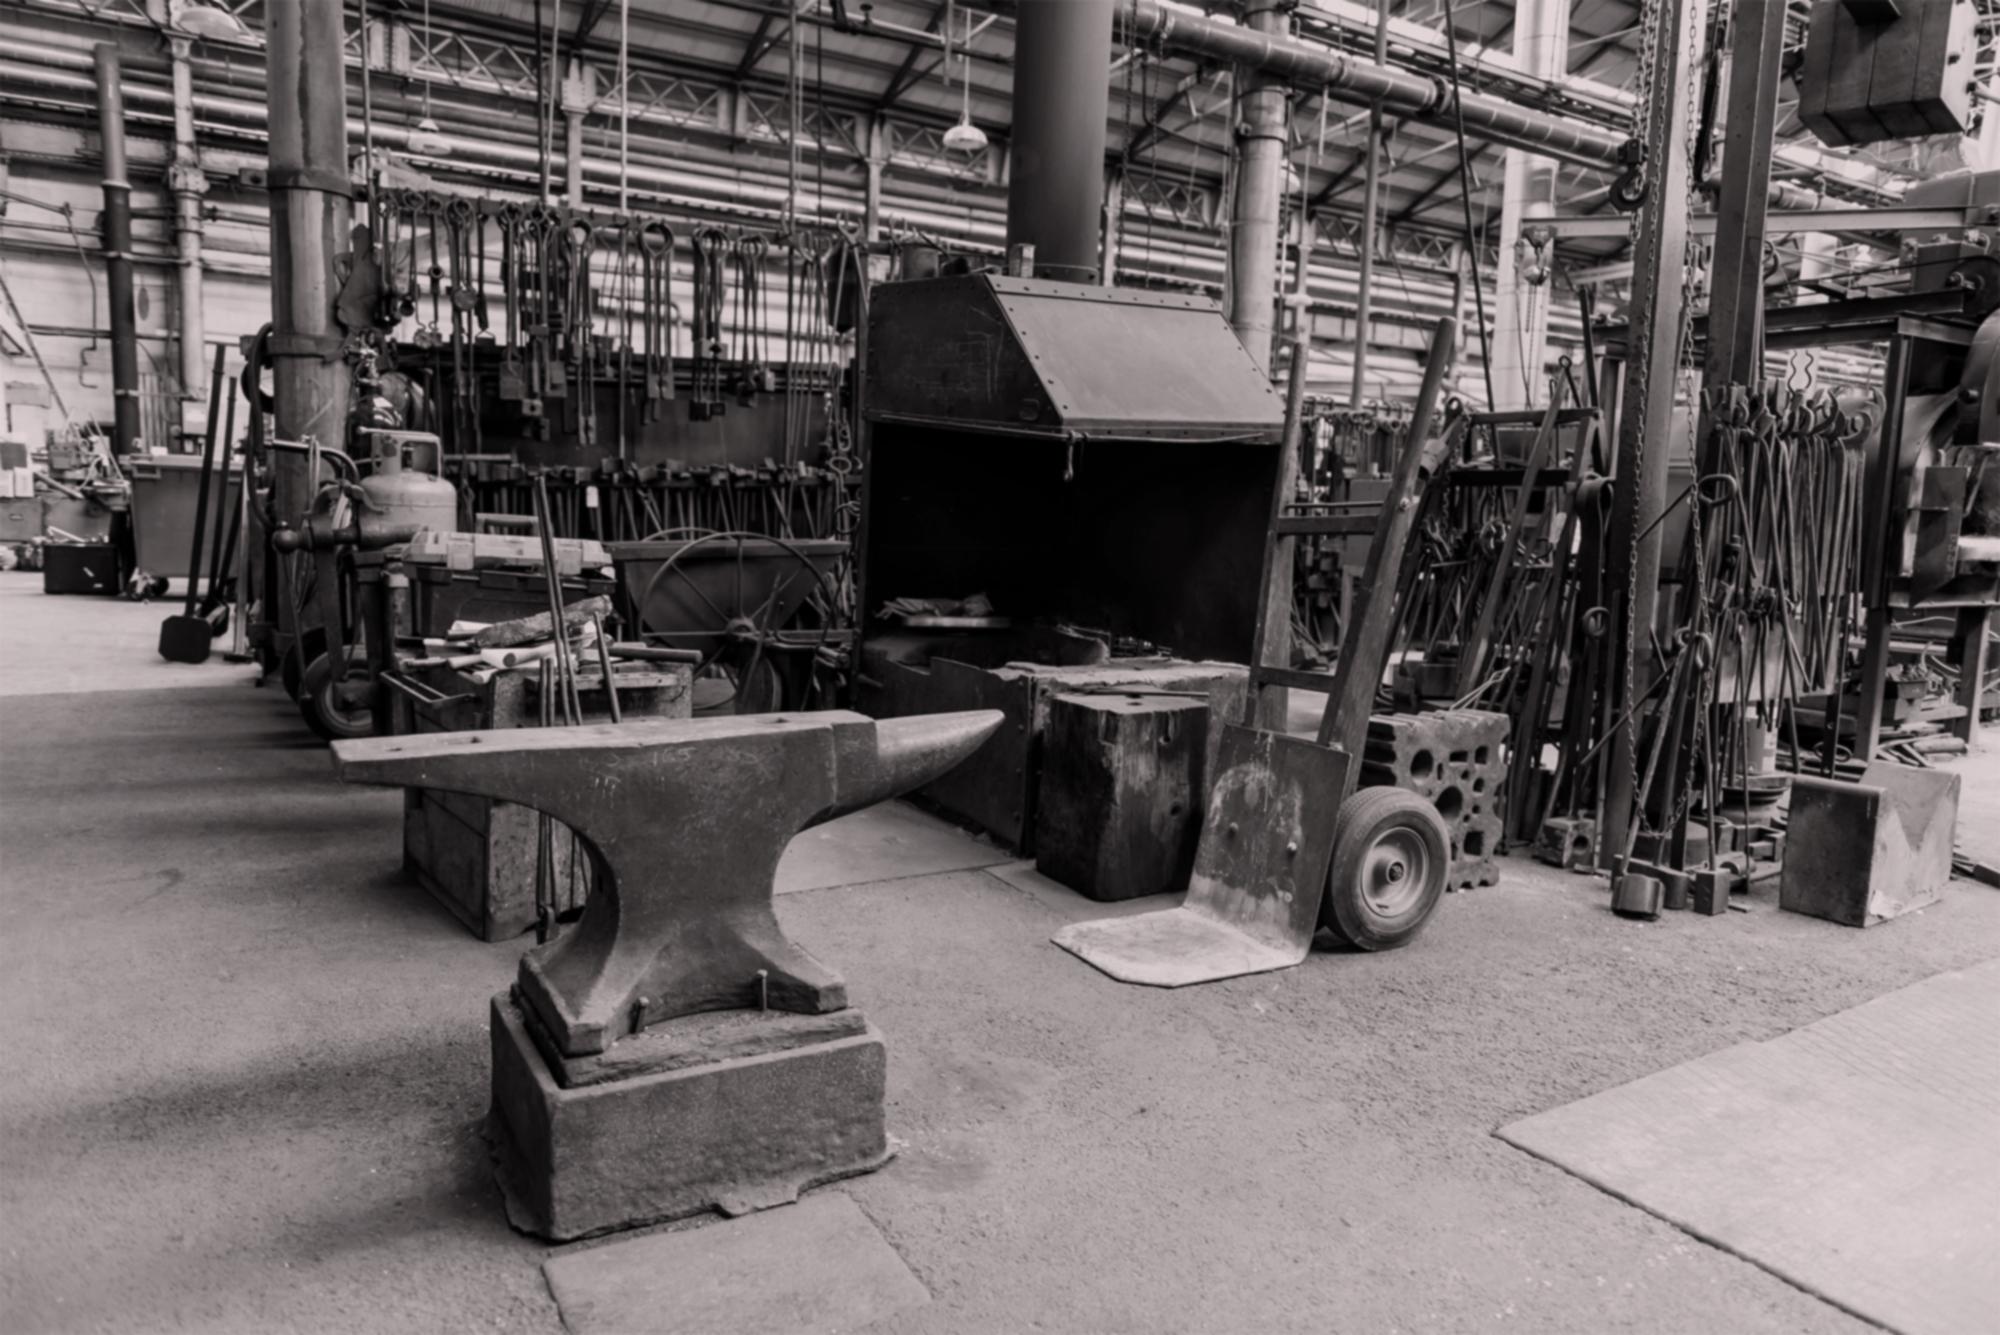 Blacksmiths_Station_Eveleigh_Locomotive_Workshops